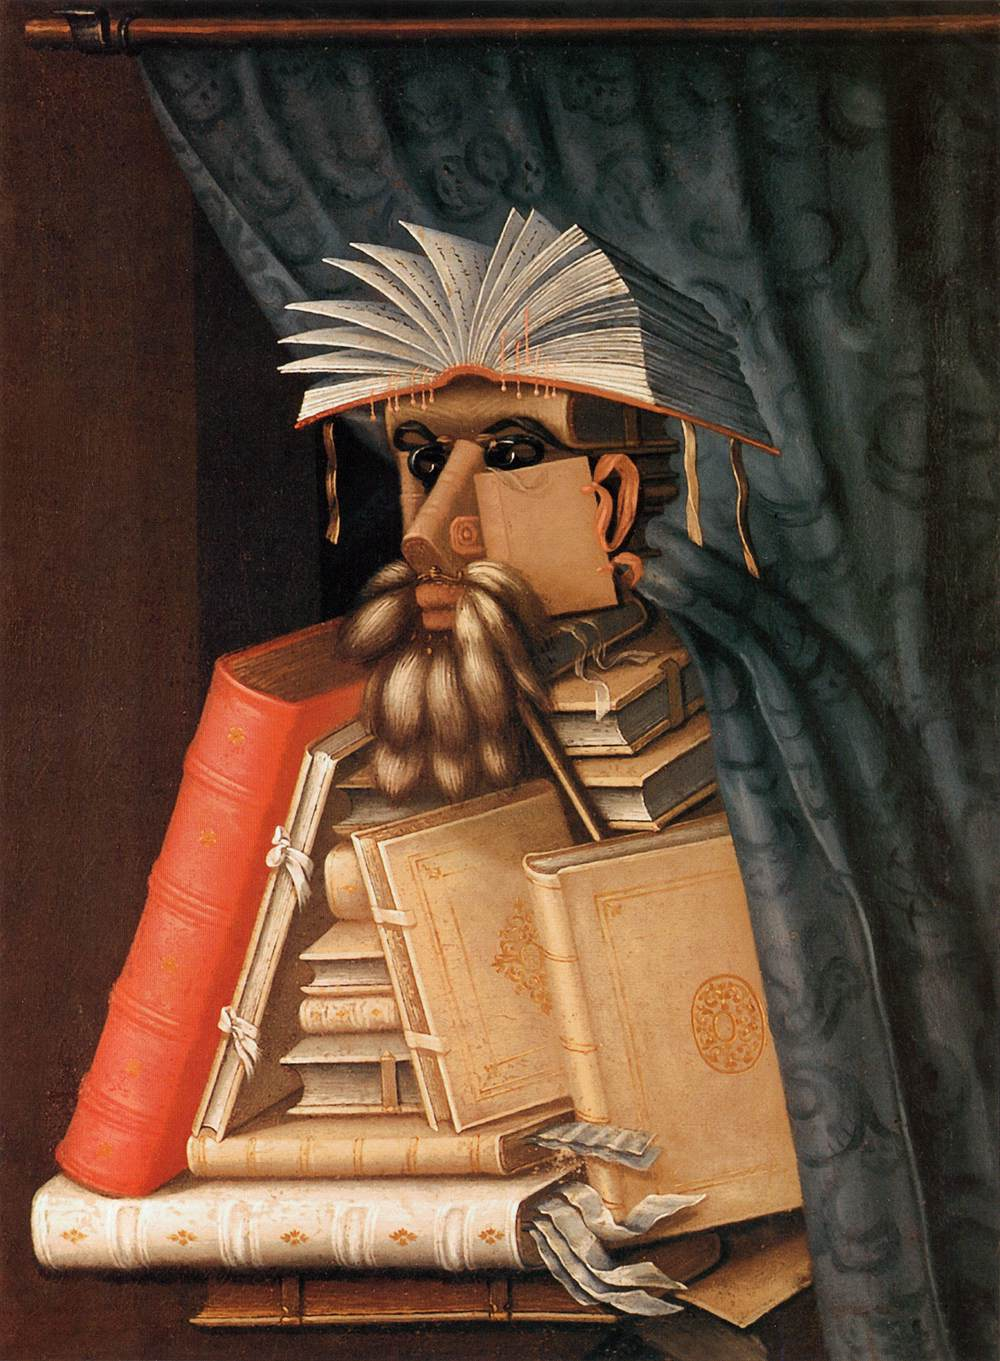 arcimboldo arte renacimiento pintura historia